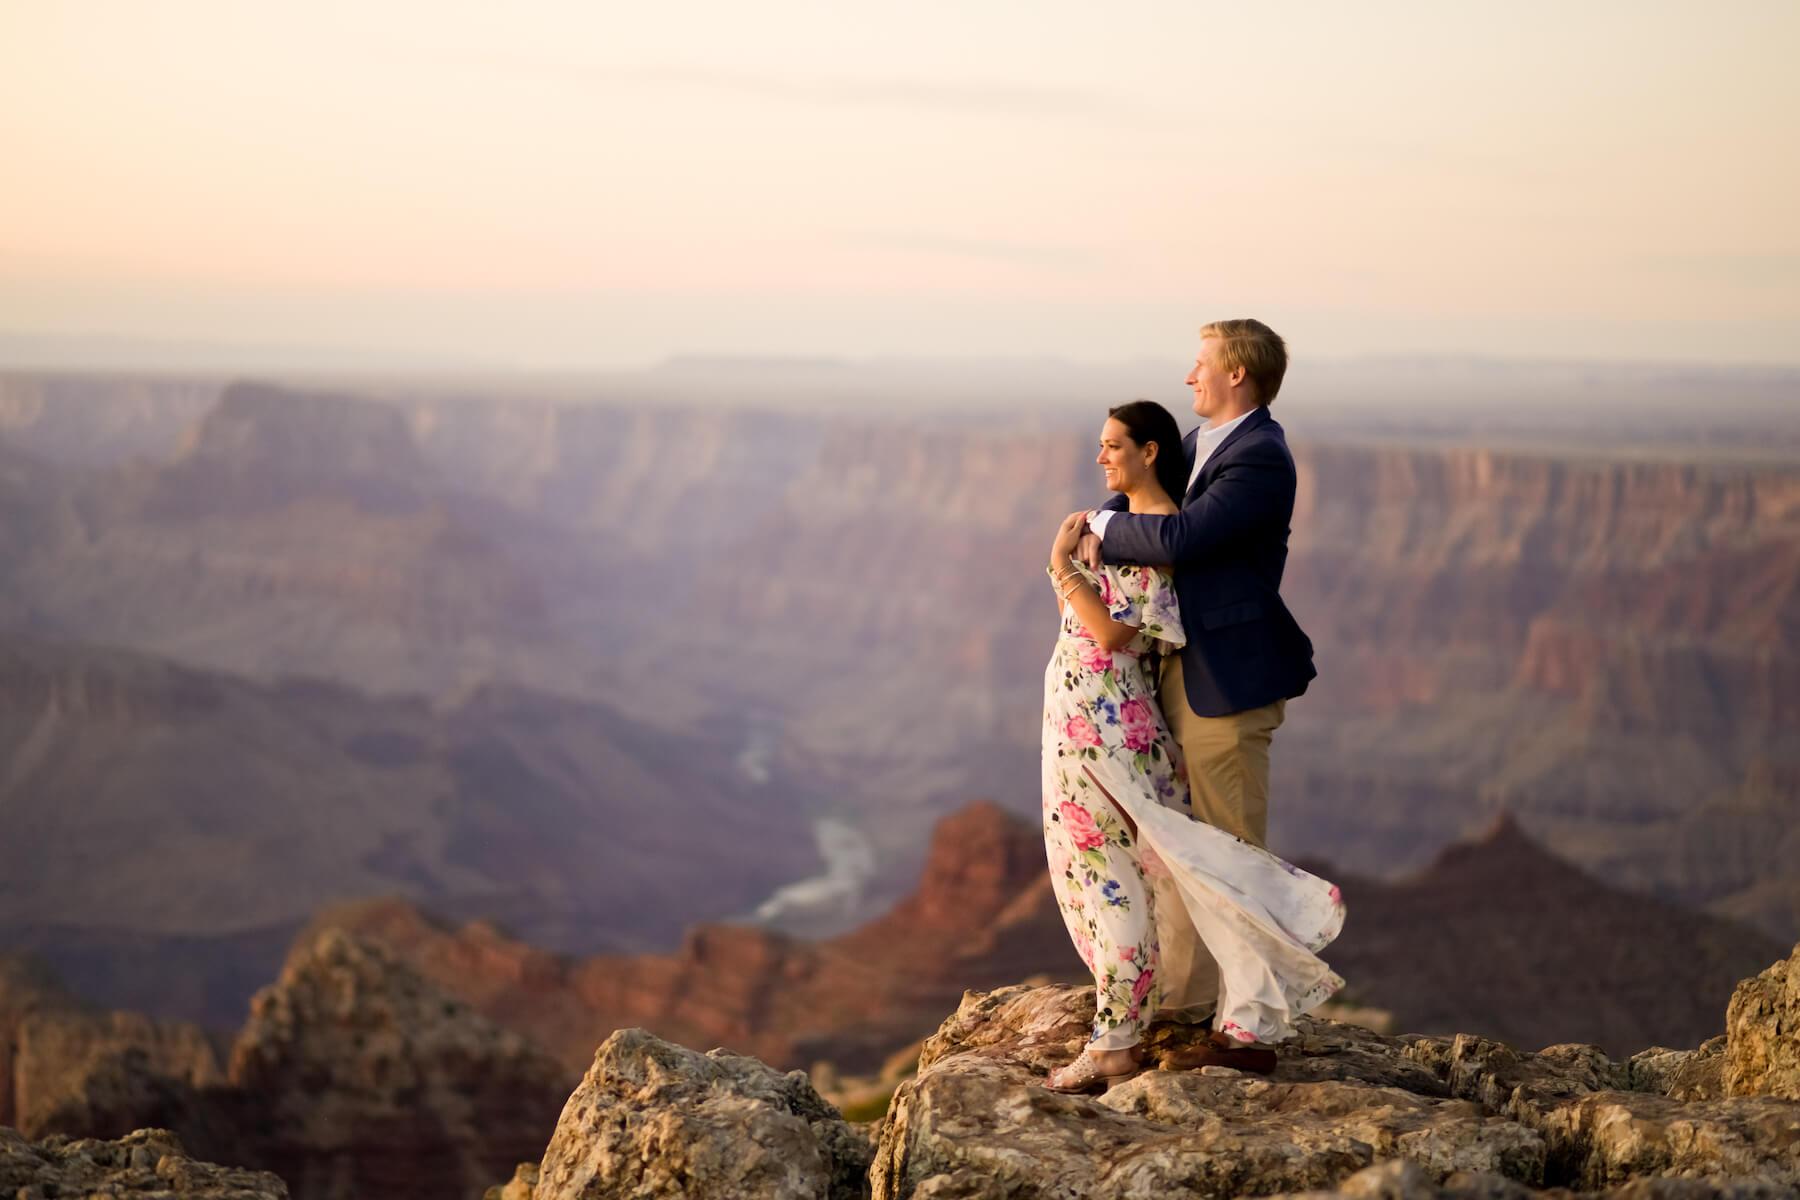 grand-canyon-heather whiteside – Grand Canyon – 06-14-2020 - Flytographer TERRI